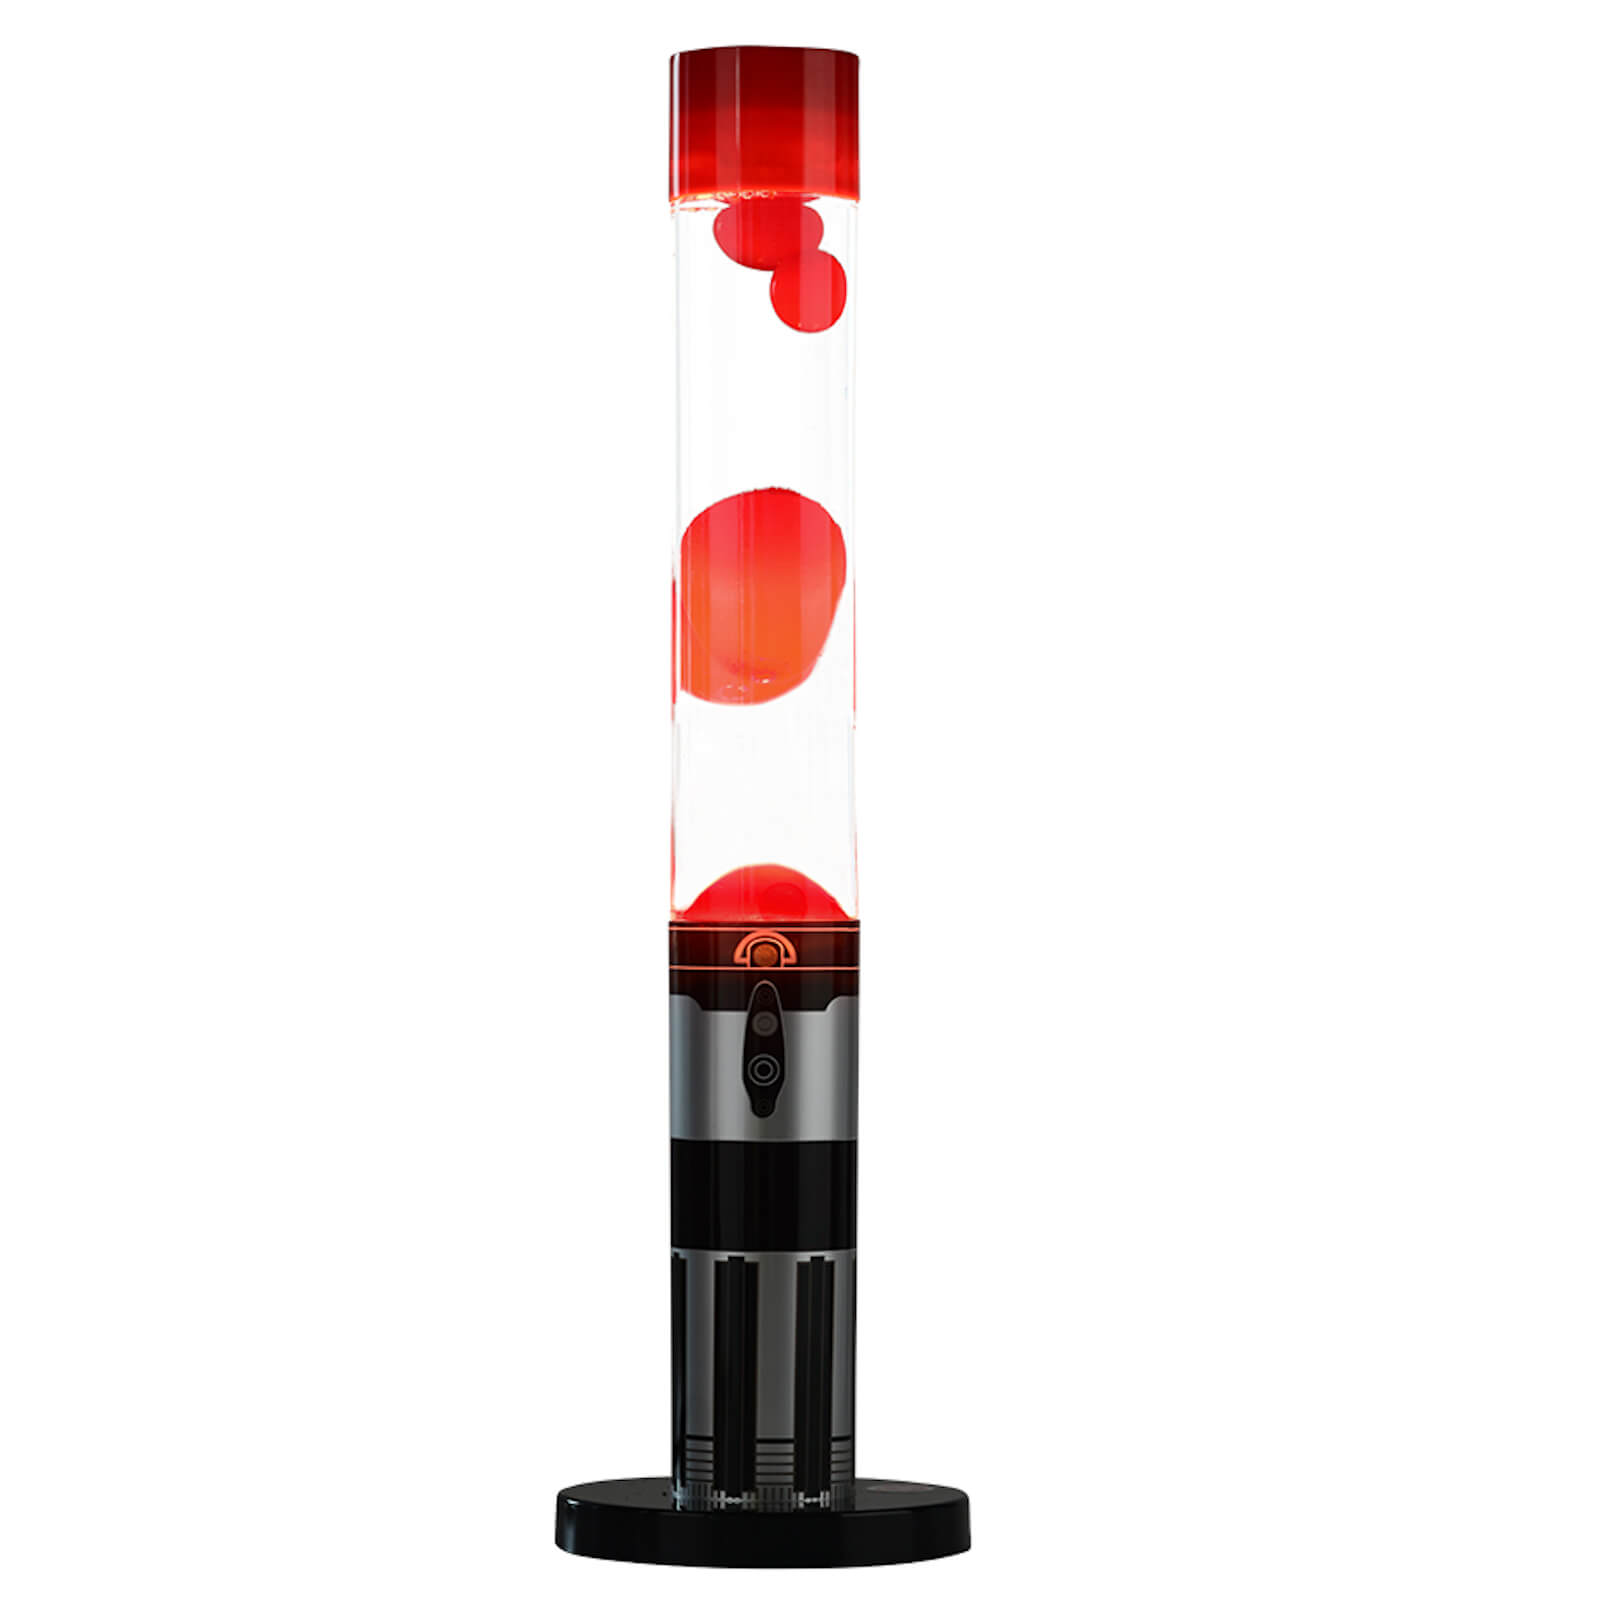 Image of Star Wars Darth Vader Motion Lamp - US Plug